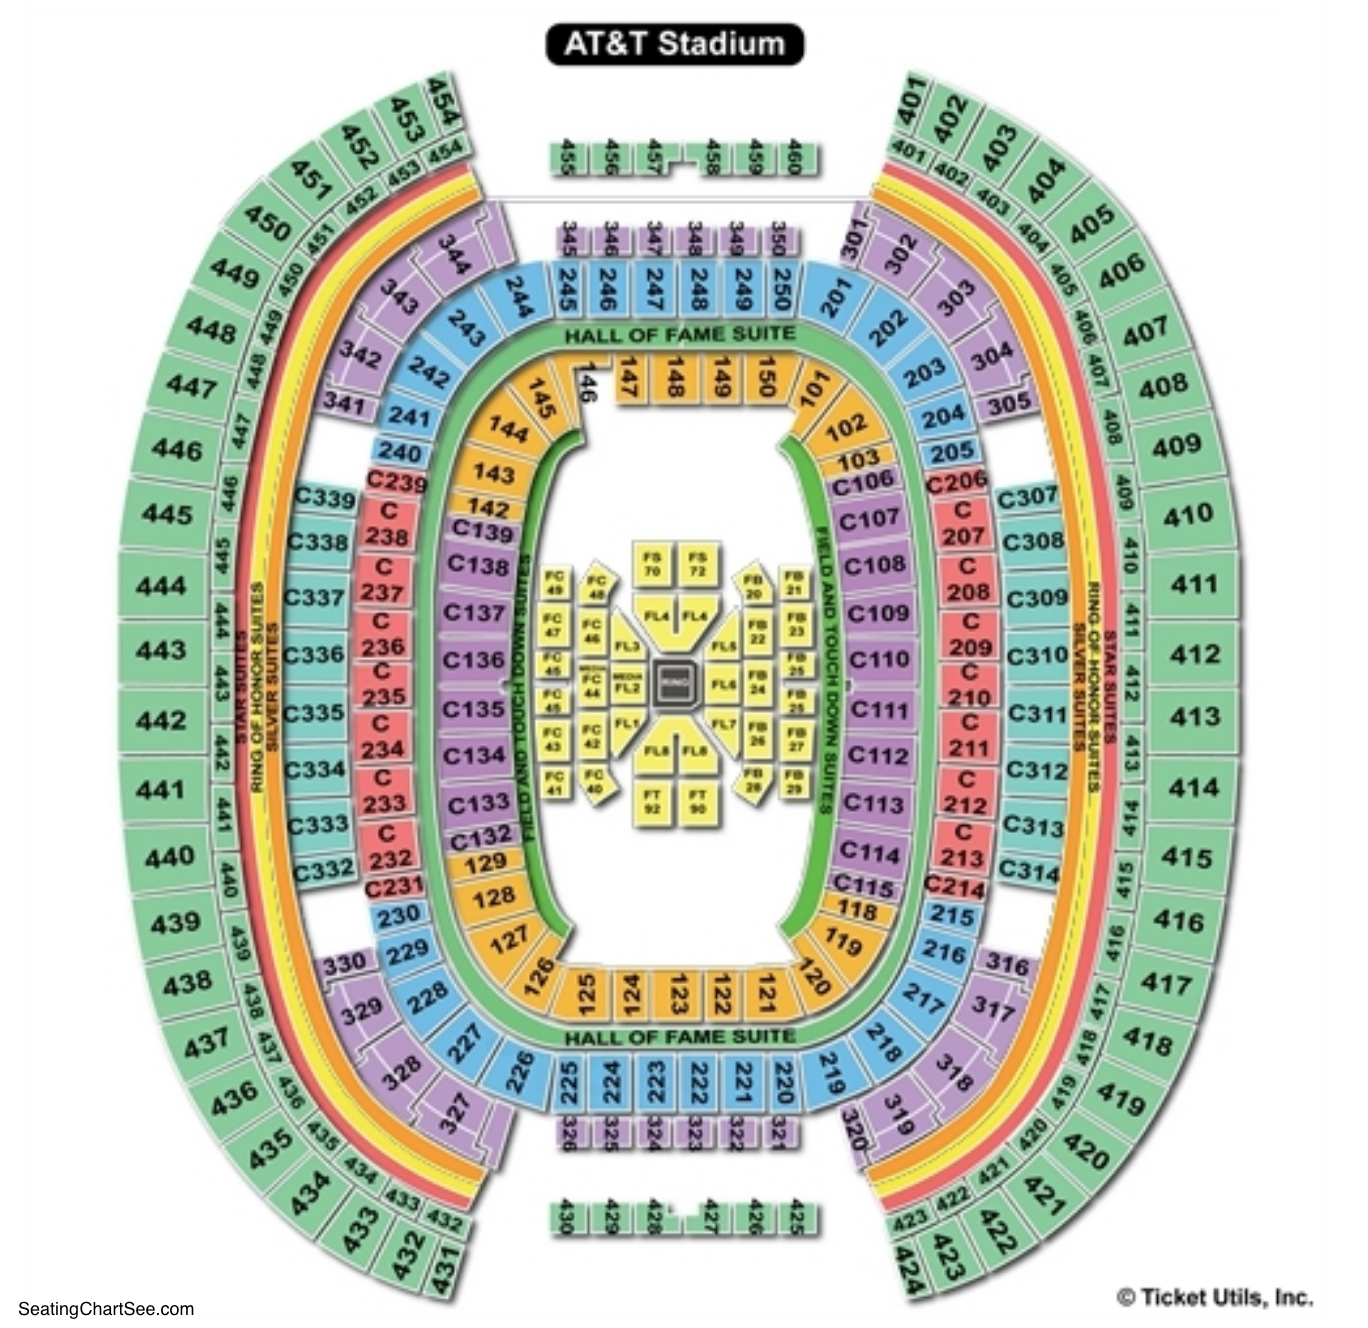 AT&T Stadium Boxing Seating Chart